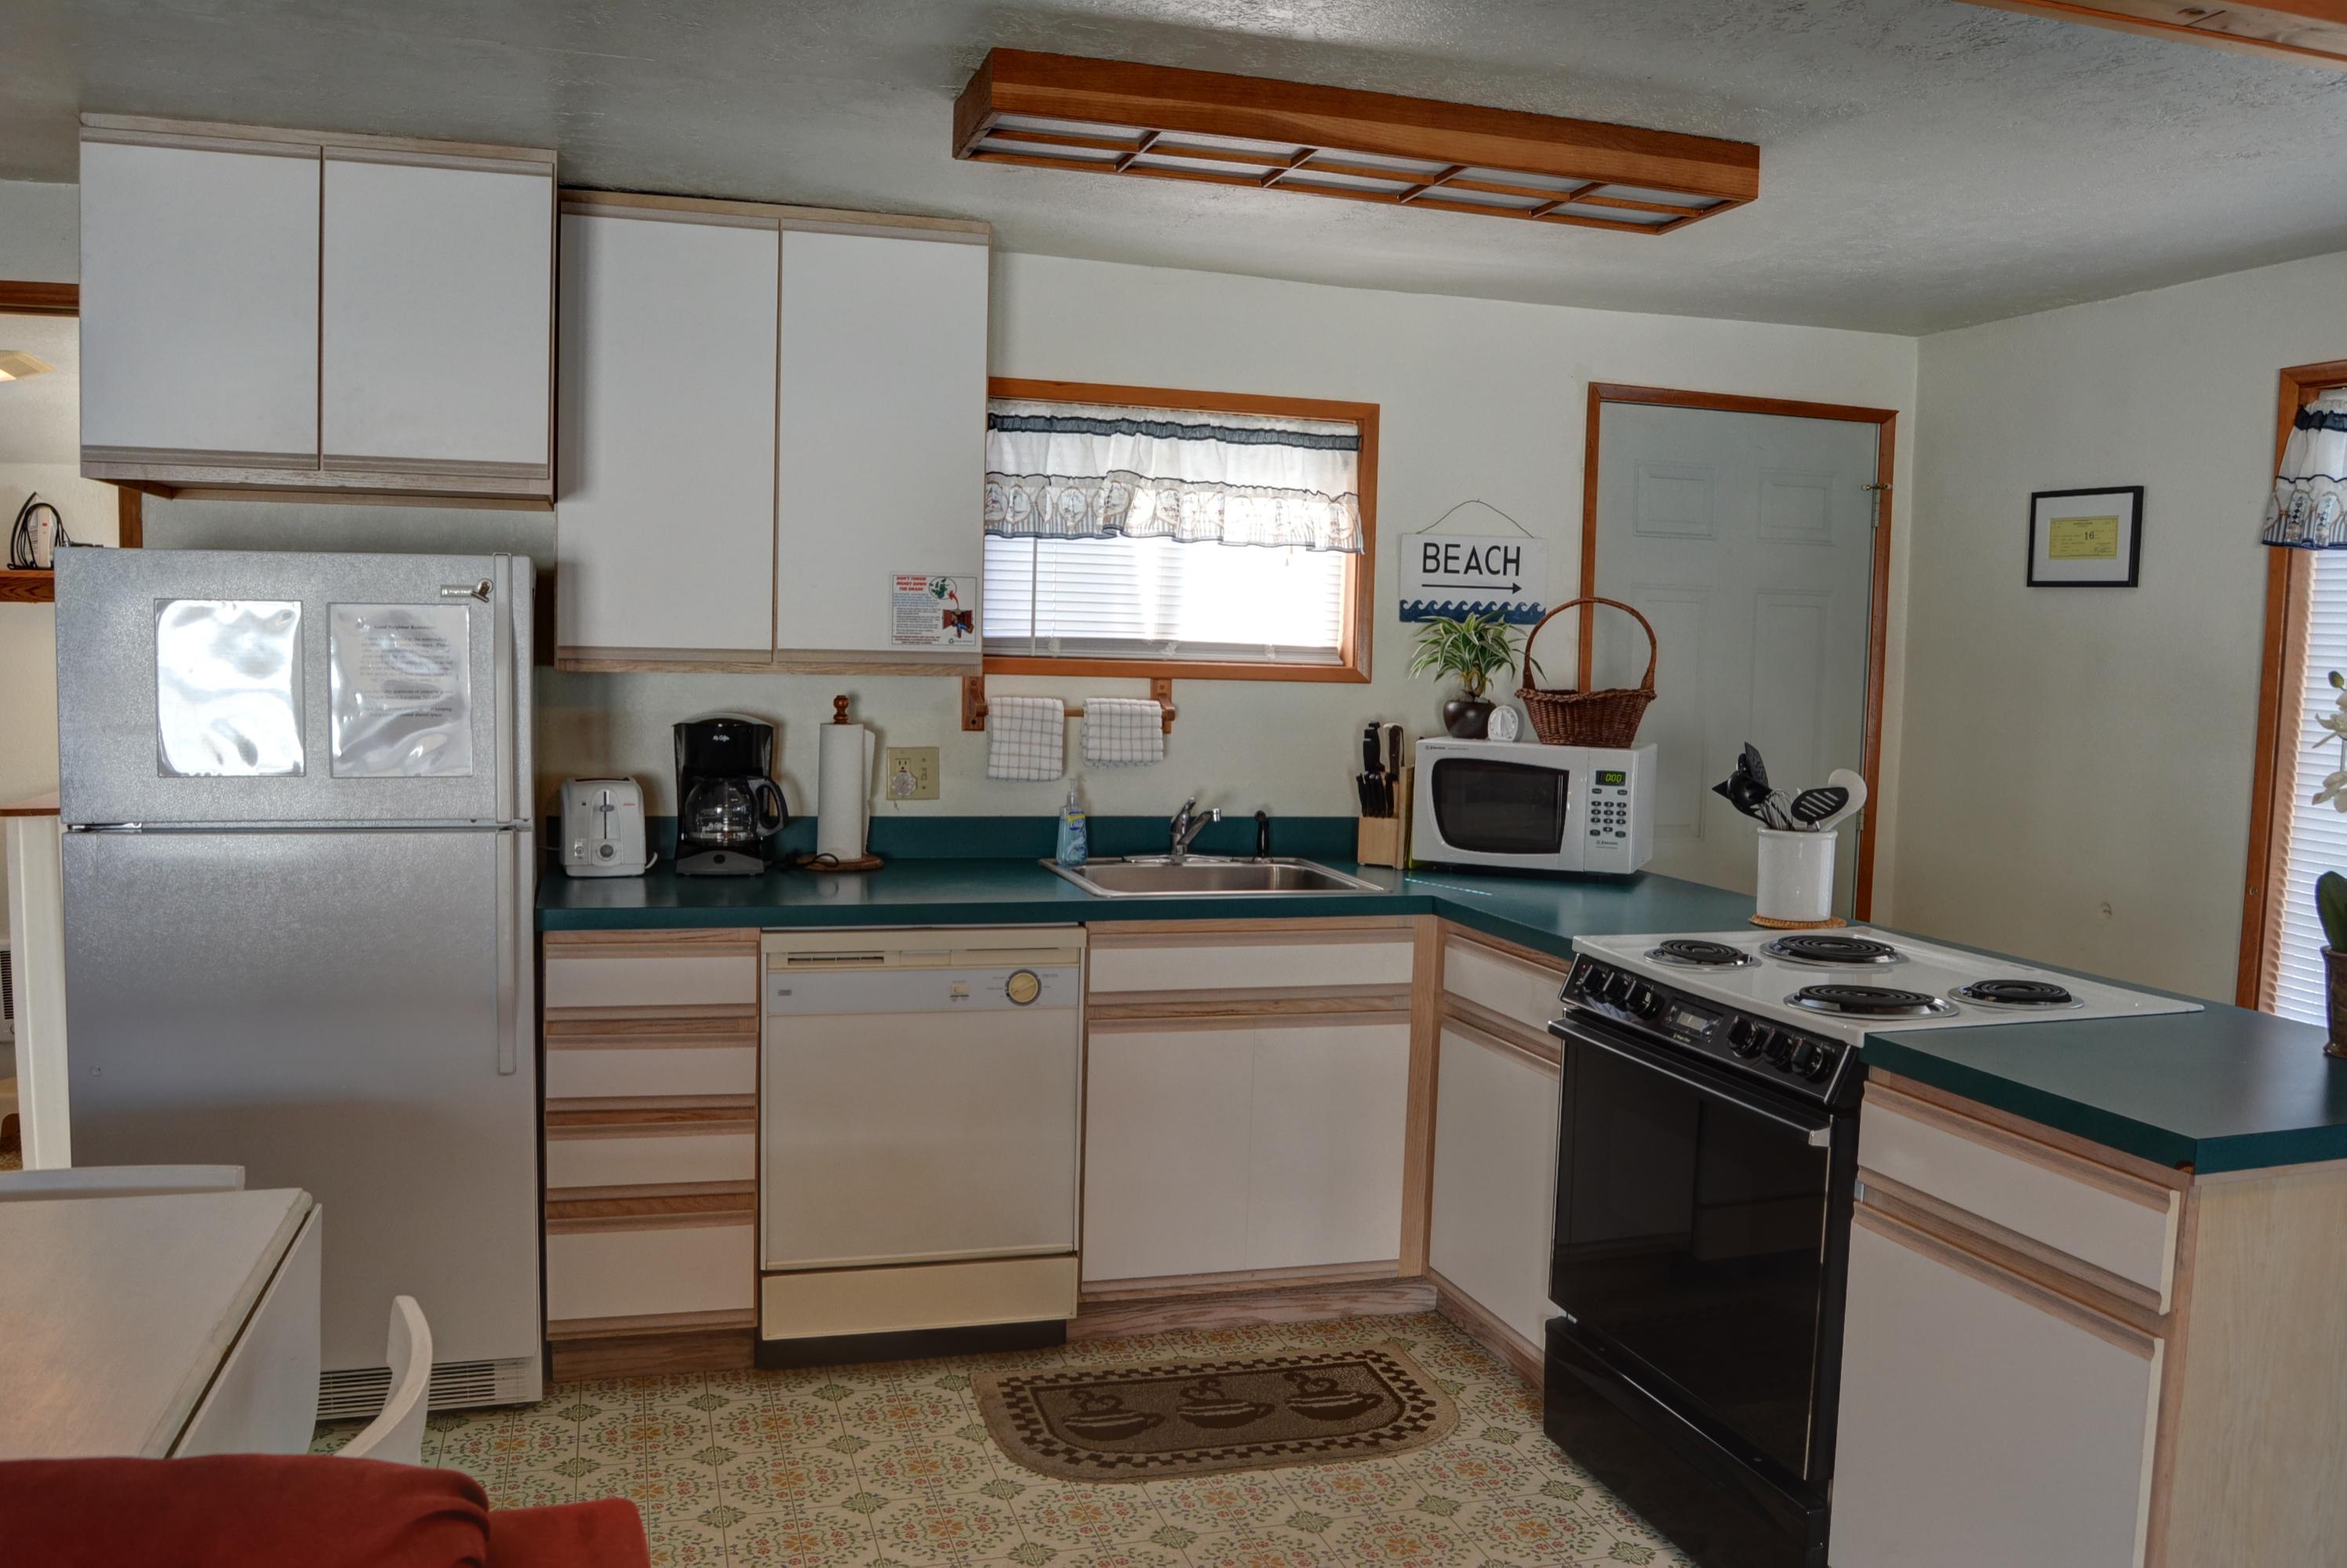 comforter american single bathroom oregon wayfair pdx inn imaginations seaside set vanity improvement home comfort